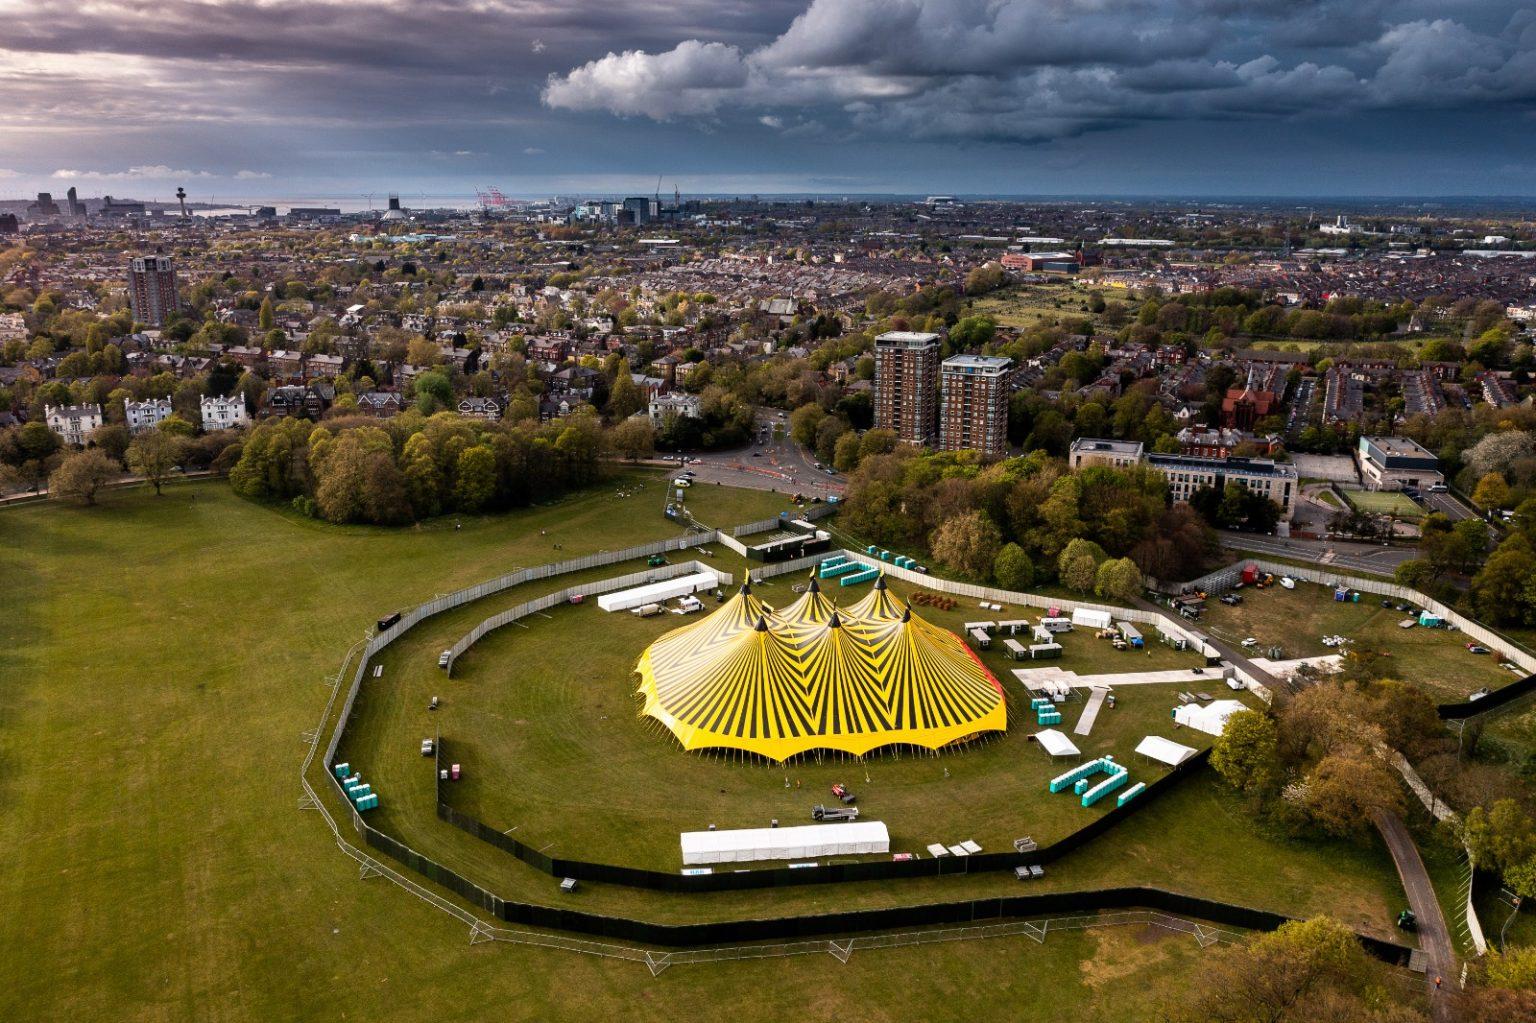 Big Top at Sefton Park